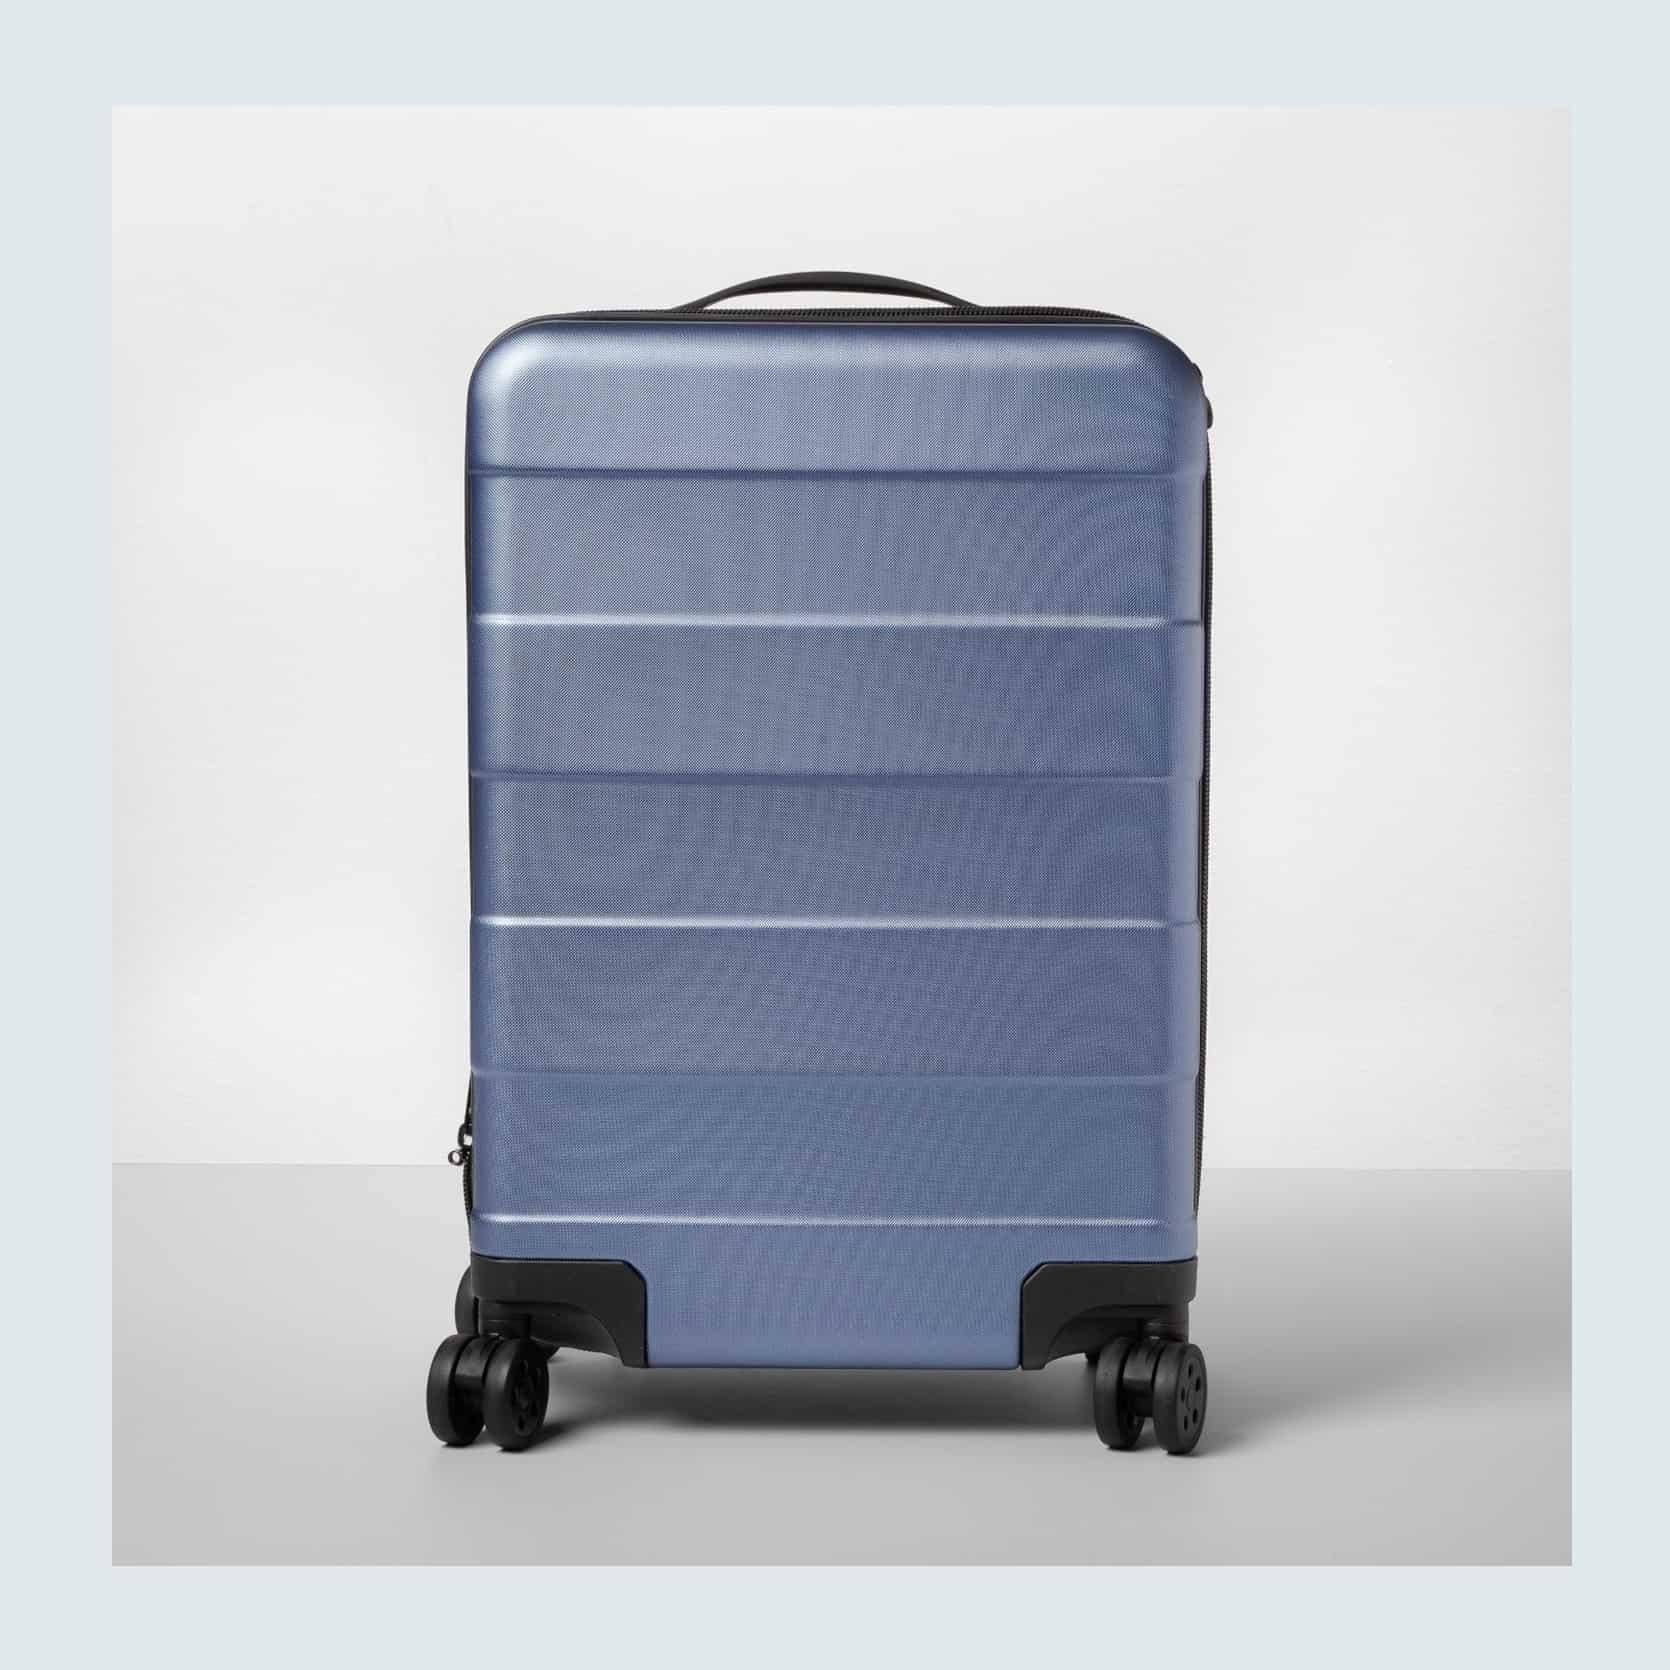 Emily Henderson Best luggage target2